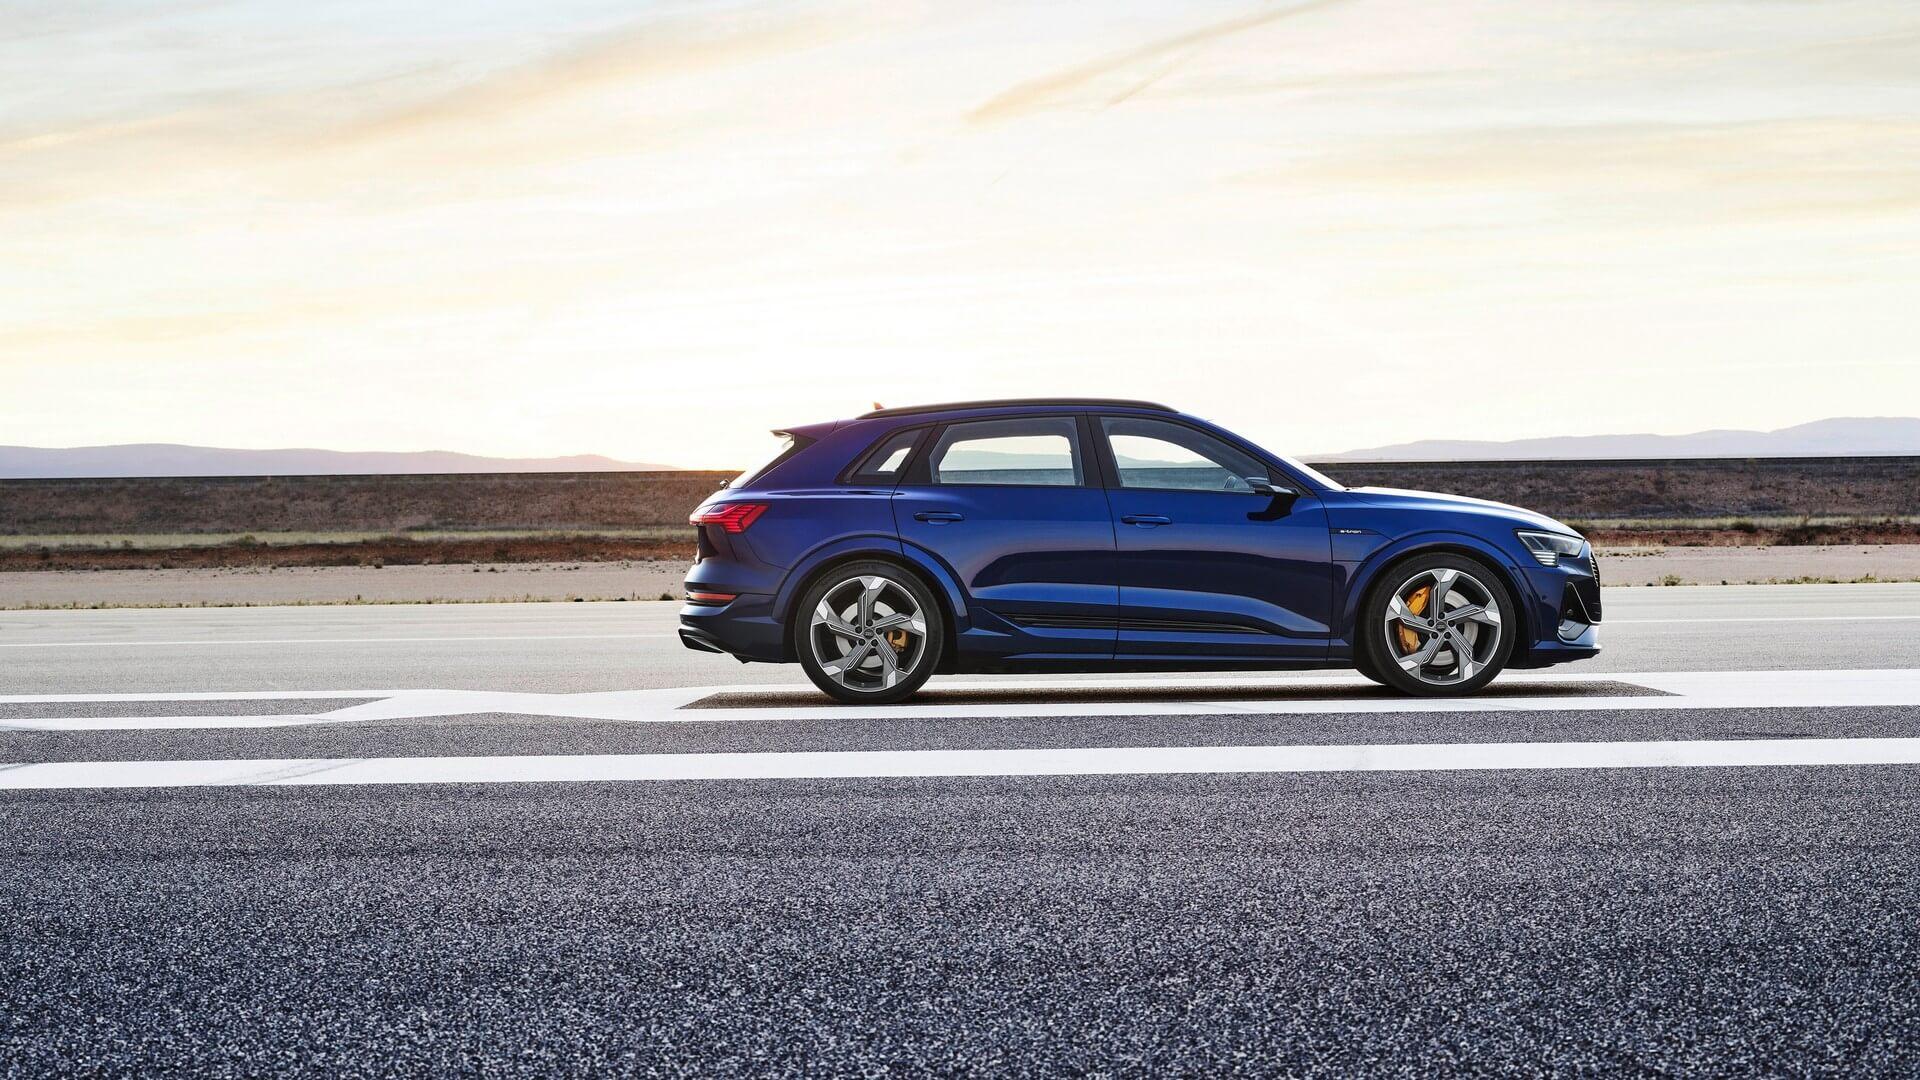 Audi-E-Tron-S-and-E-Tron-S-Sportback-2020-21